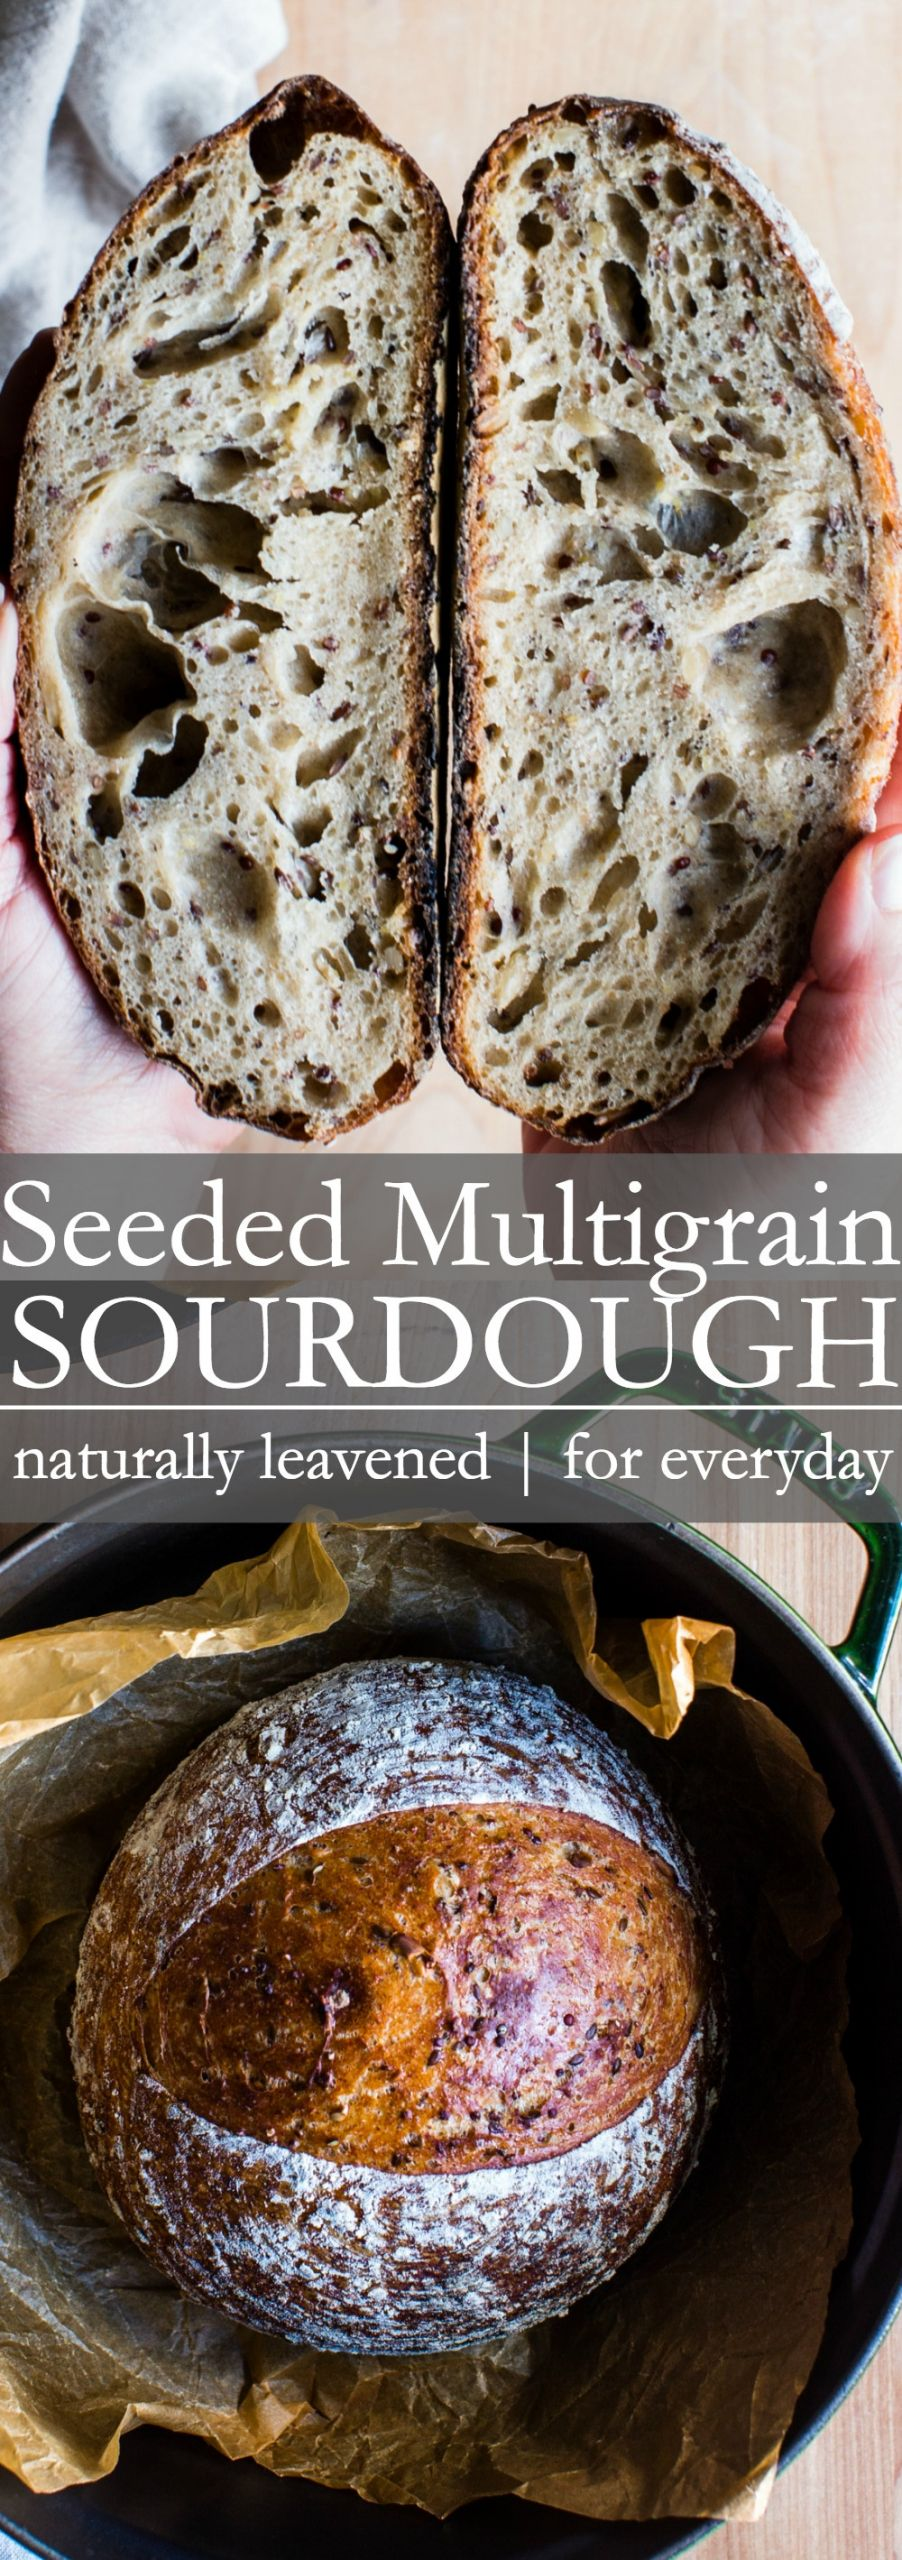 Multigrain Sourdough Bread  Seeded Multigrain Sourdough Bread